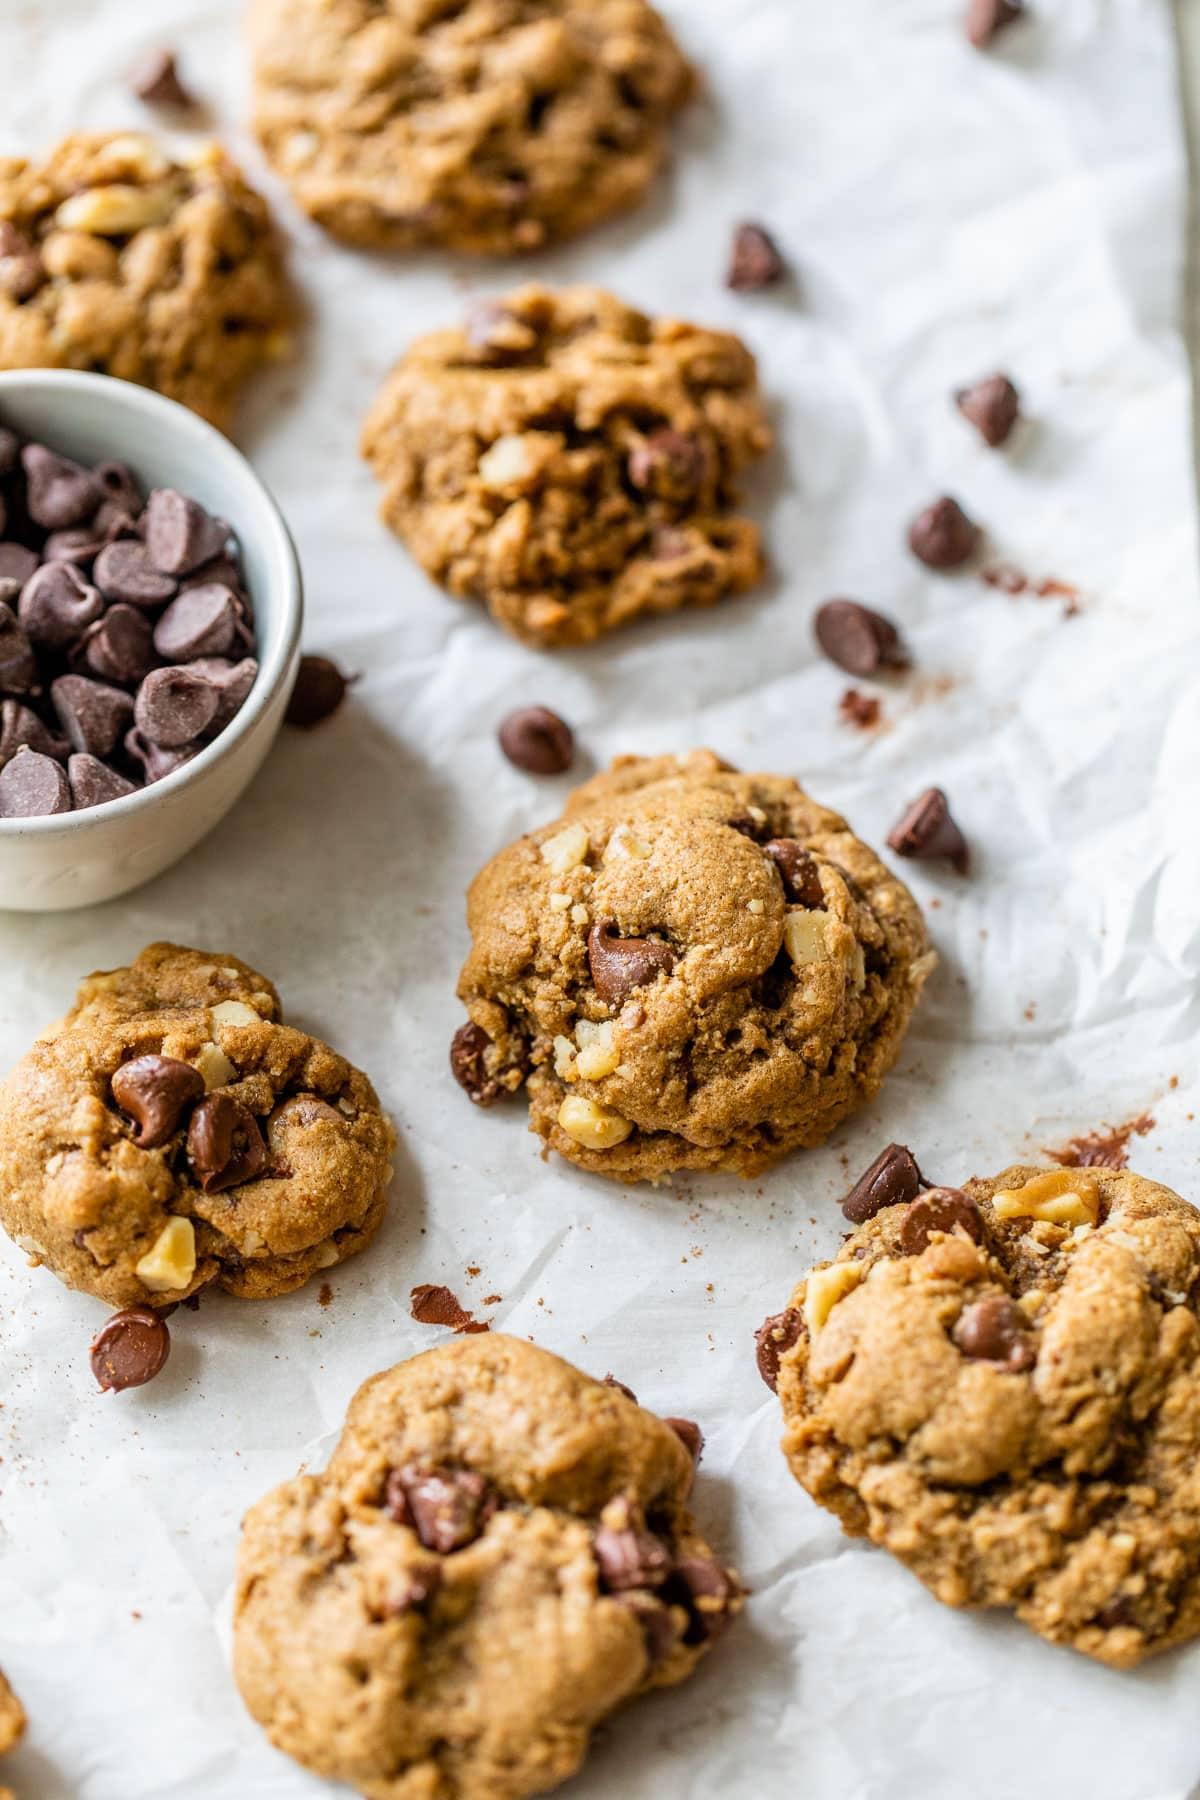 Whole Wheat Walnut Chocolate Chip Cookies with espresso, dark chocolate and cinnamon.